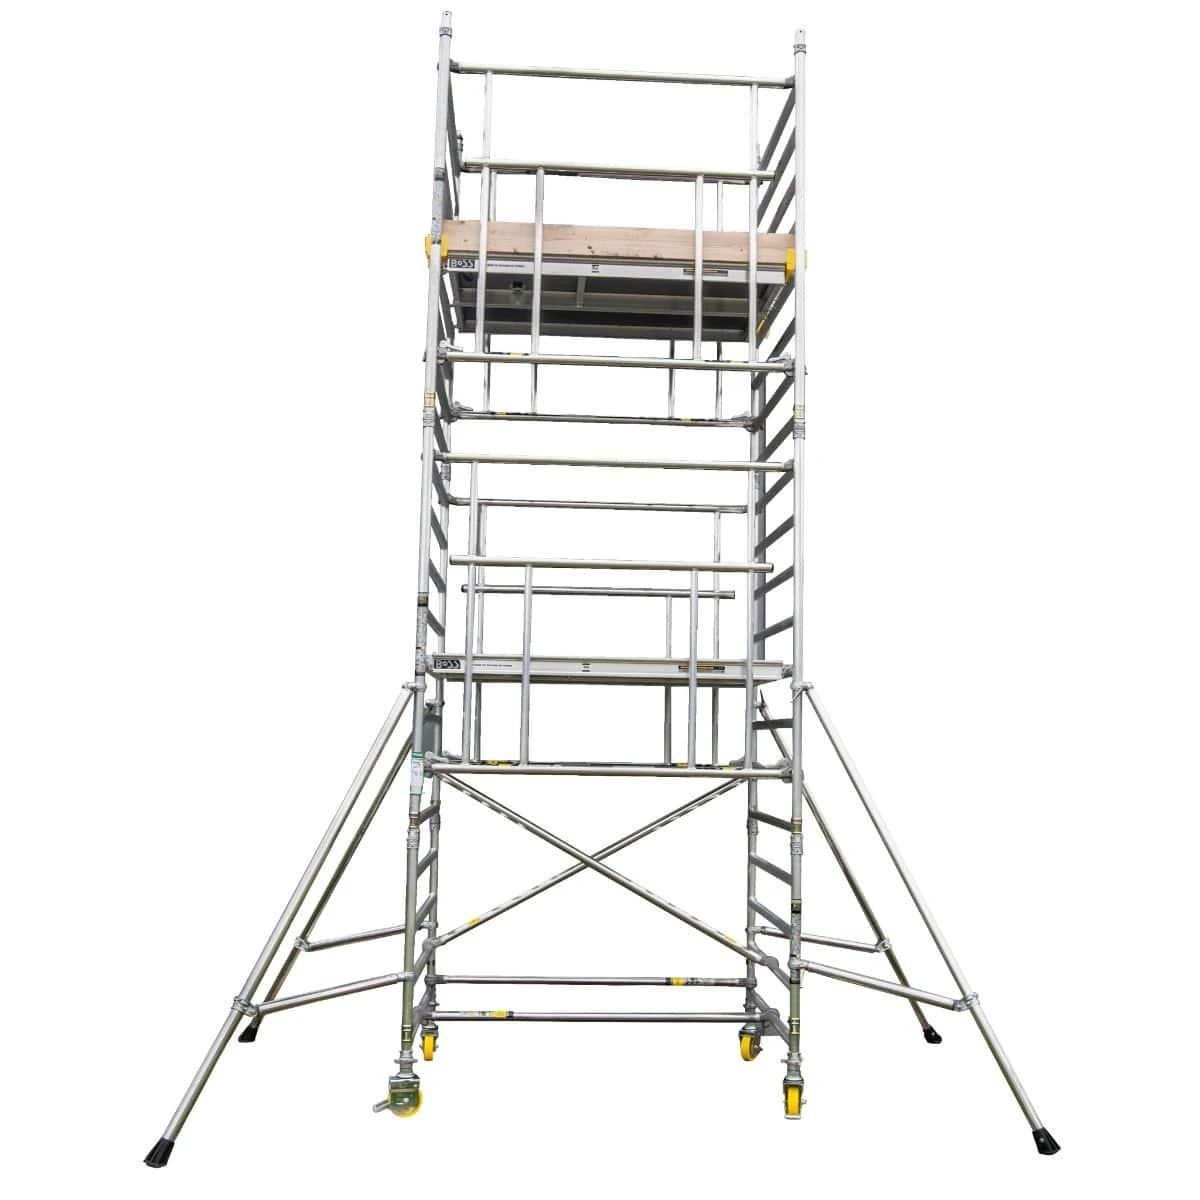 Boss Narrow 1.8m Camlock AGR Tower 3.3m Handrail Height 112Kg